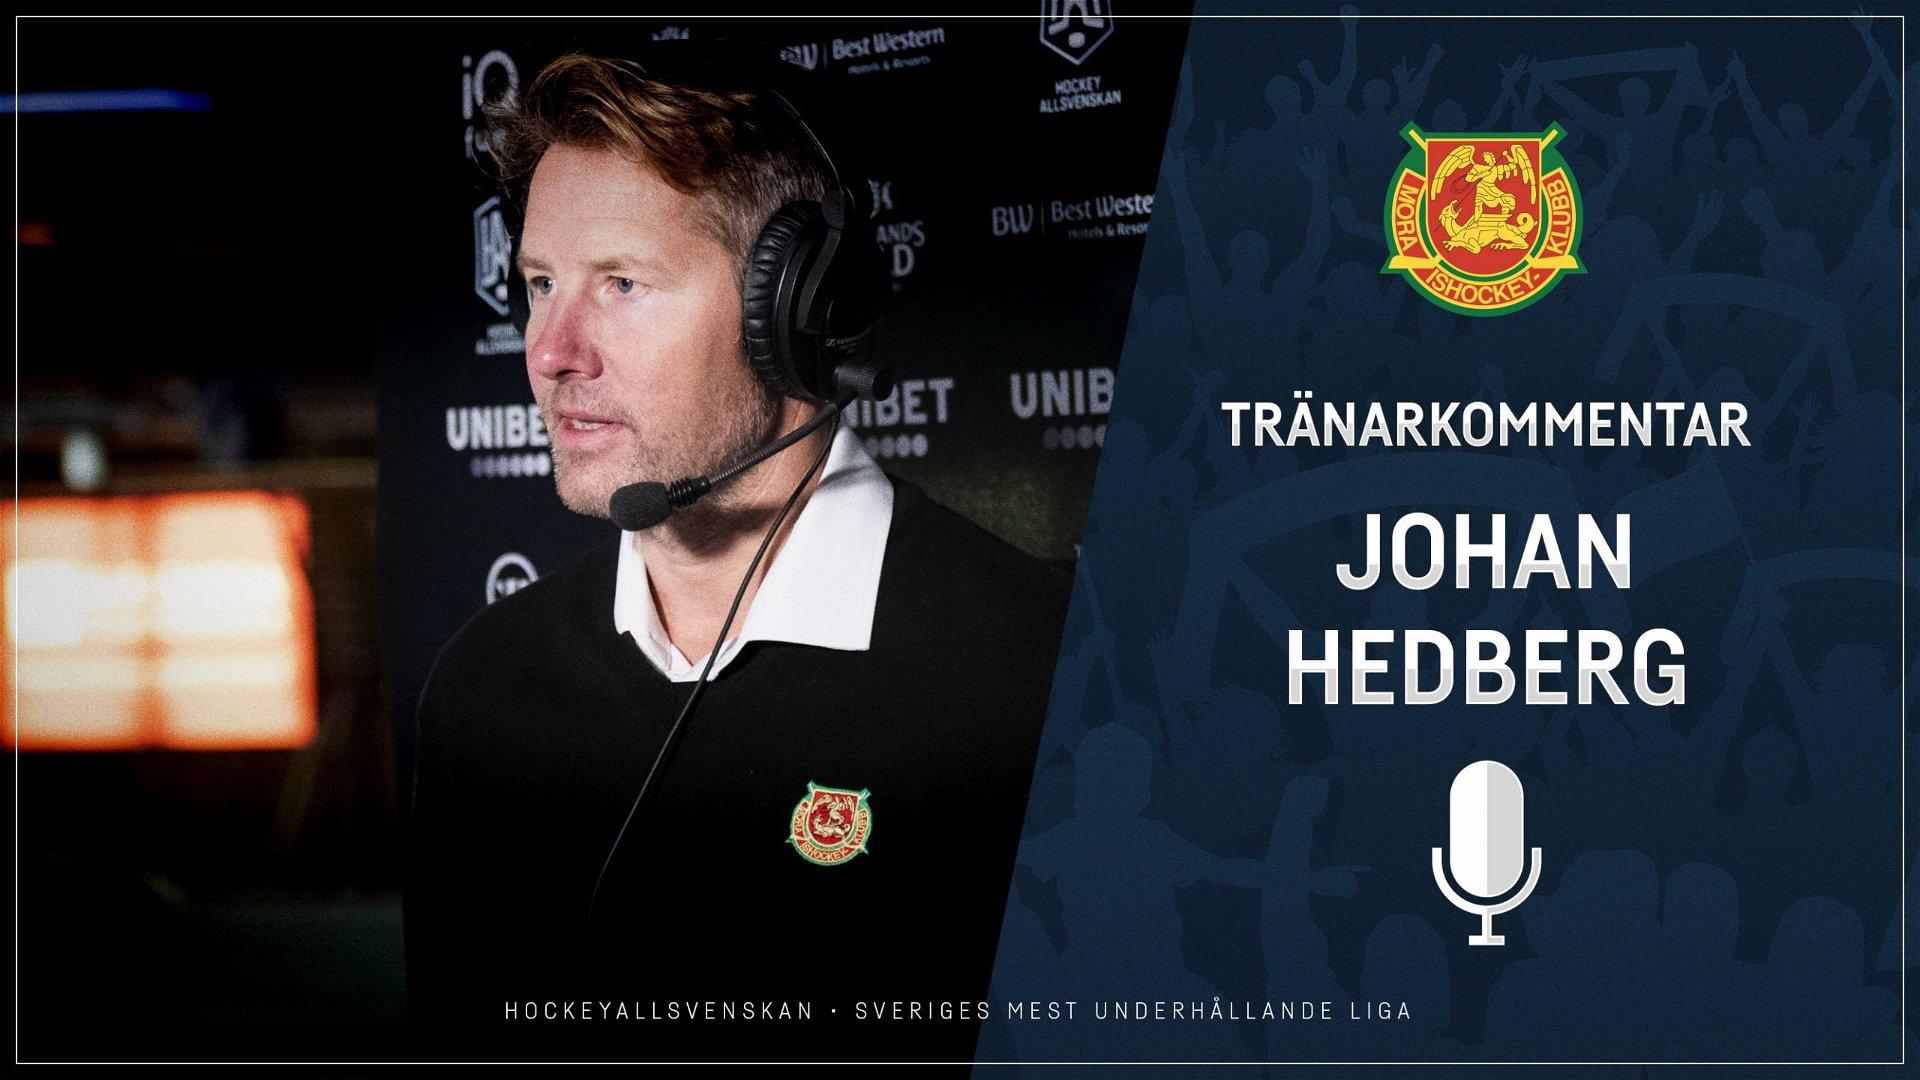 2021-01-29 Segerintervju: Johan Hedberg